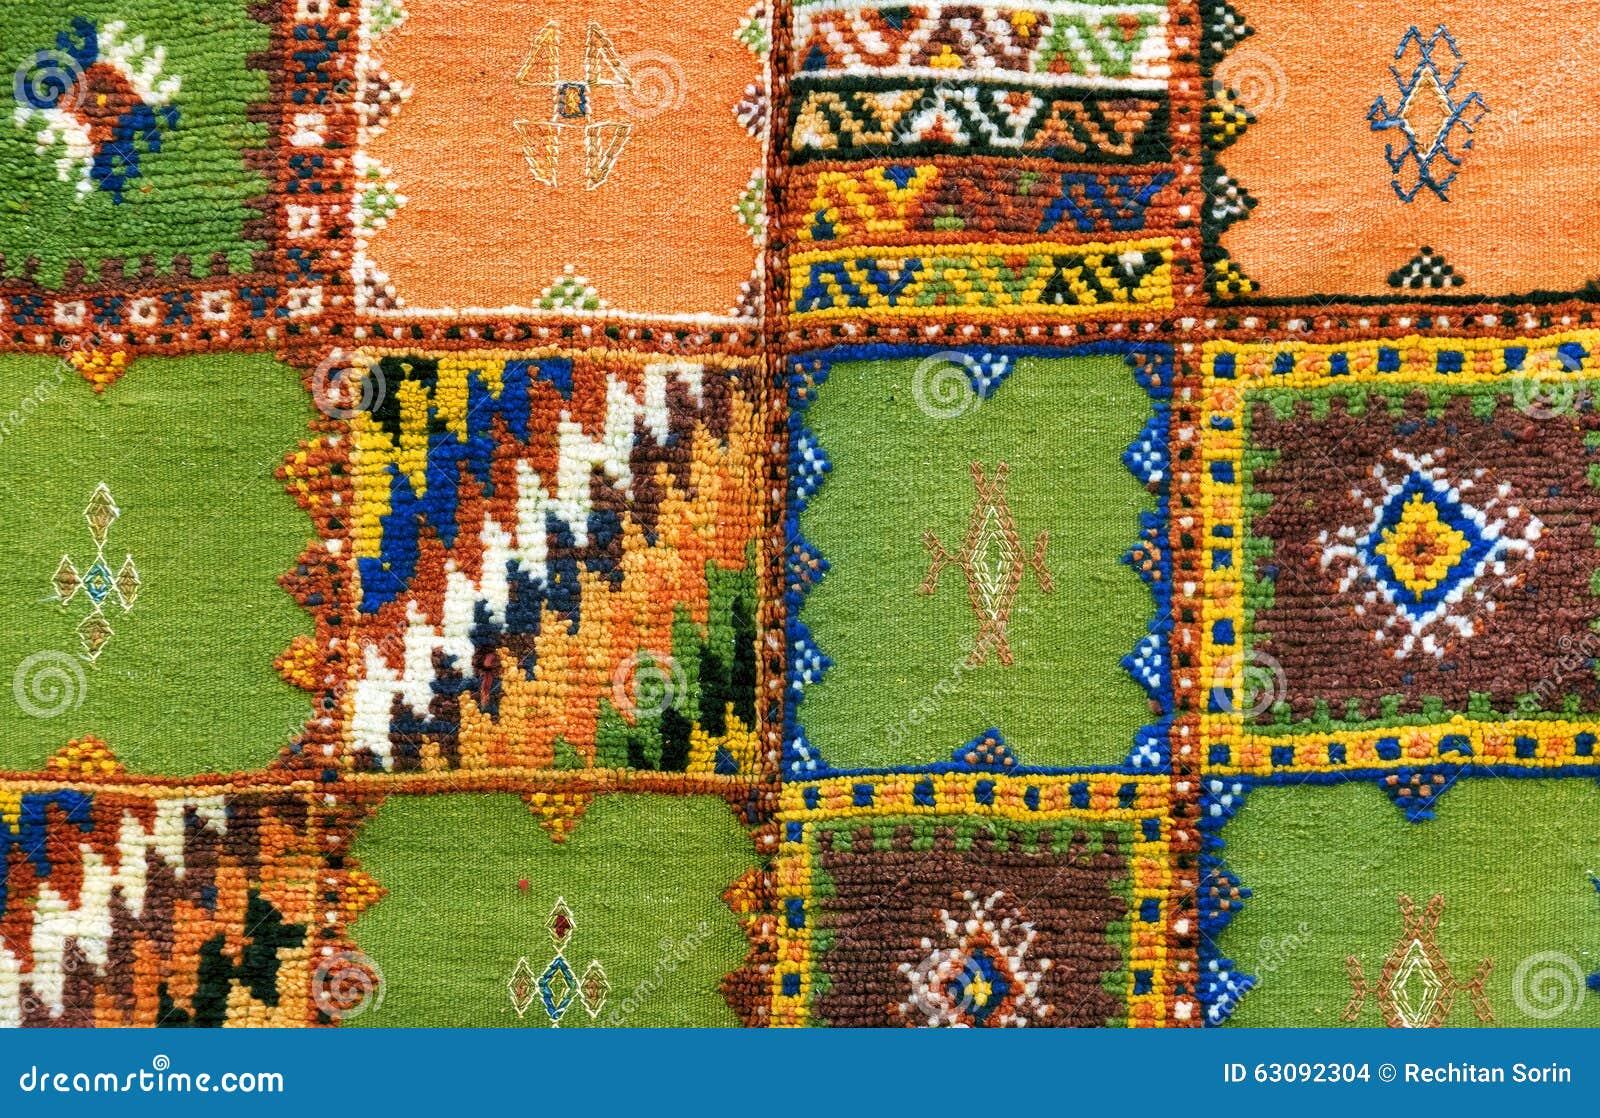 Download Fond marocain de tapis photo stock. Image du handicraft - 63092304